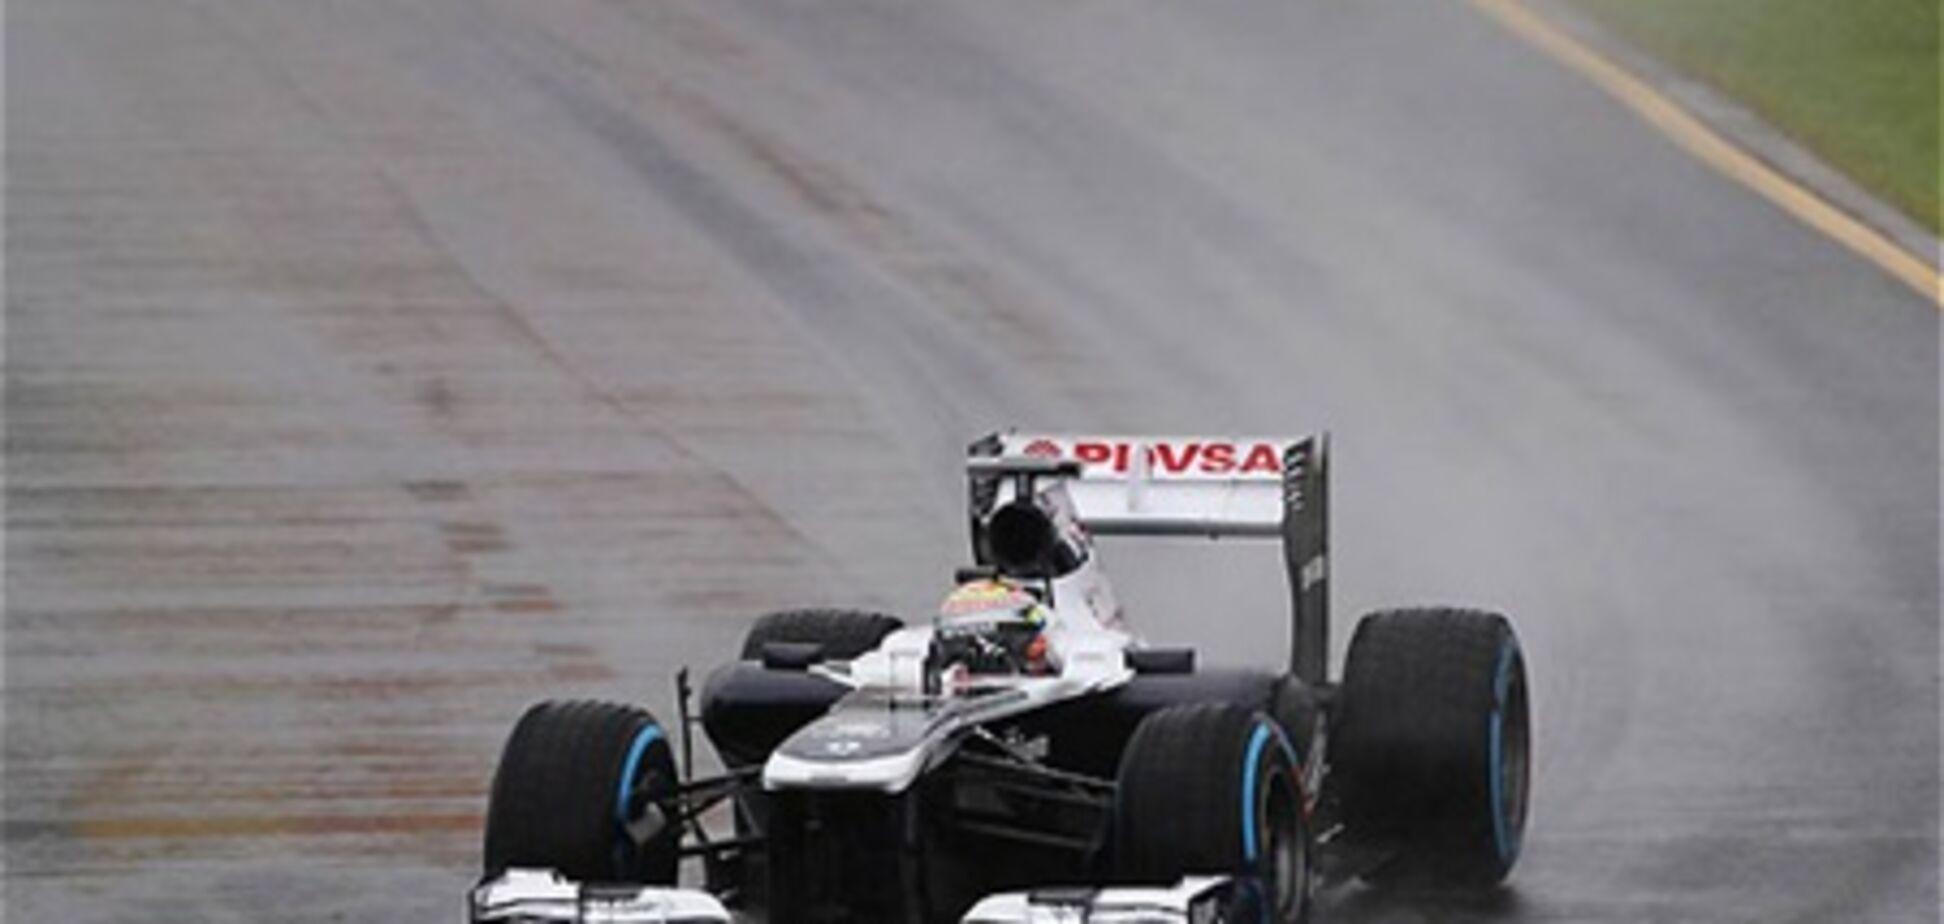 Формула-1. Погода против Гран-при Австралии